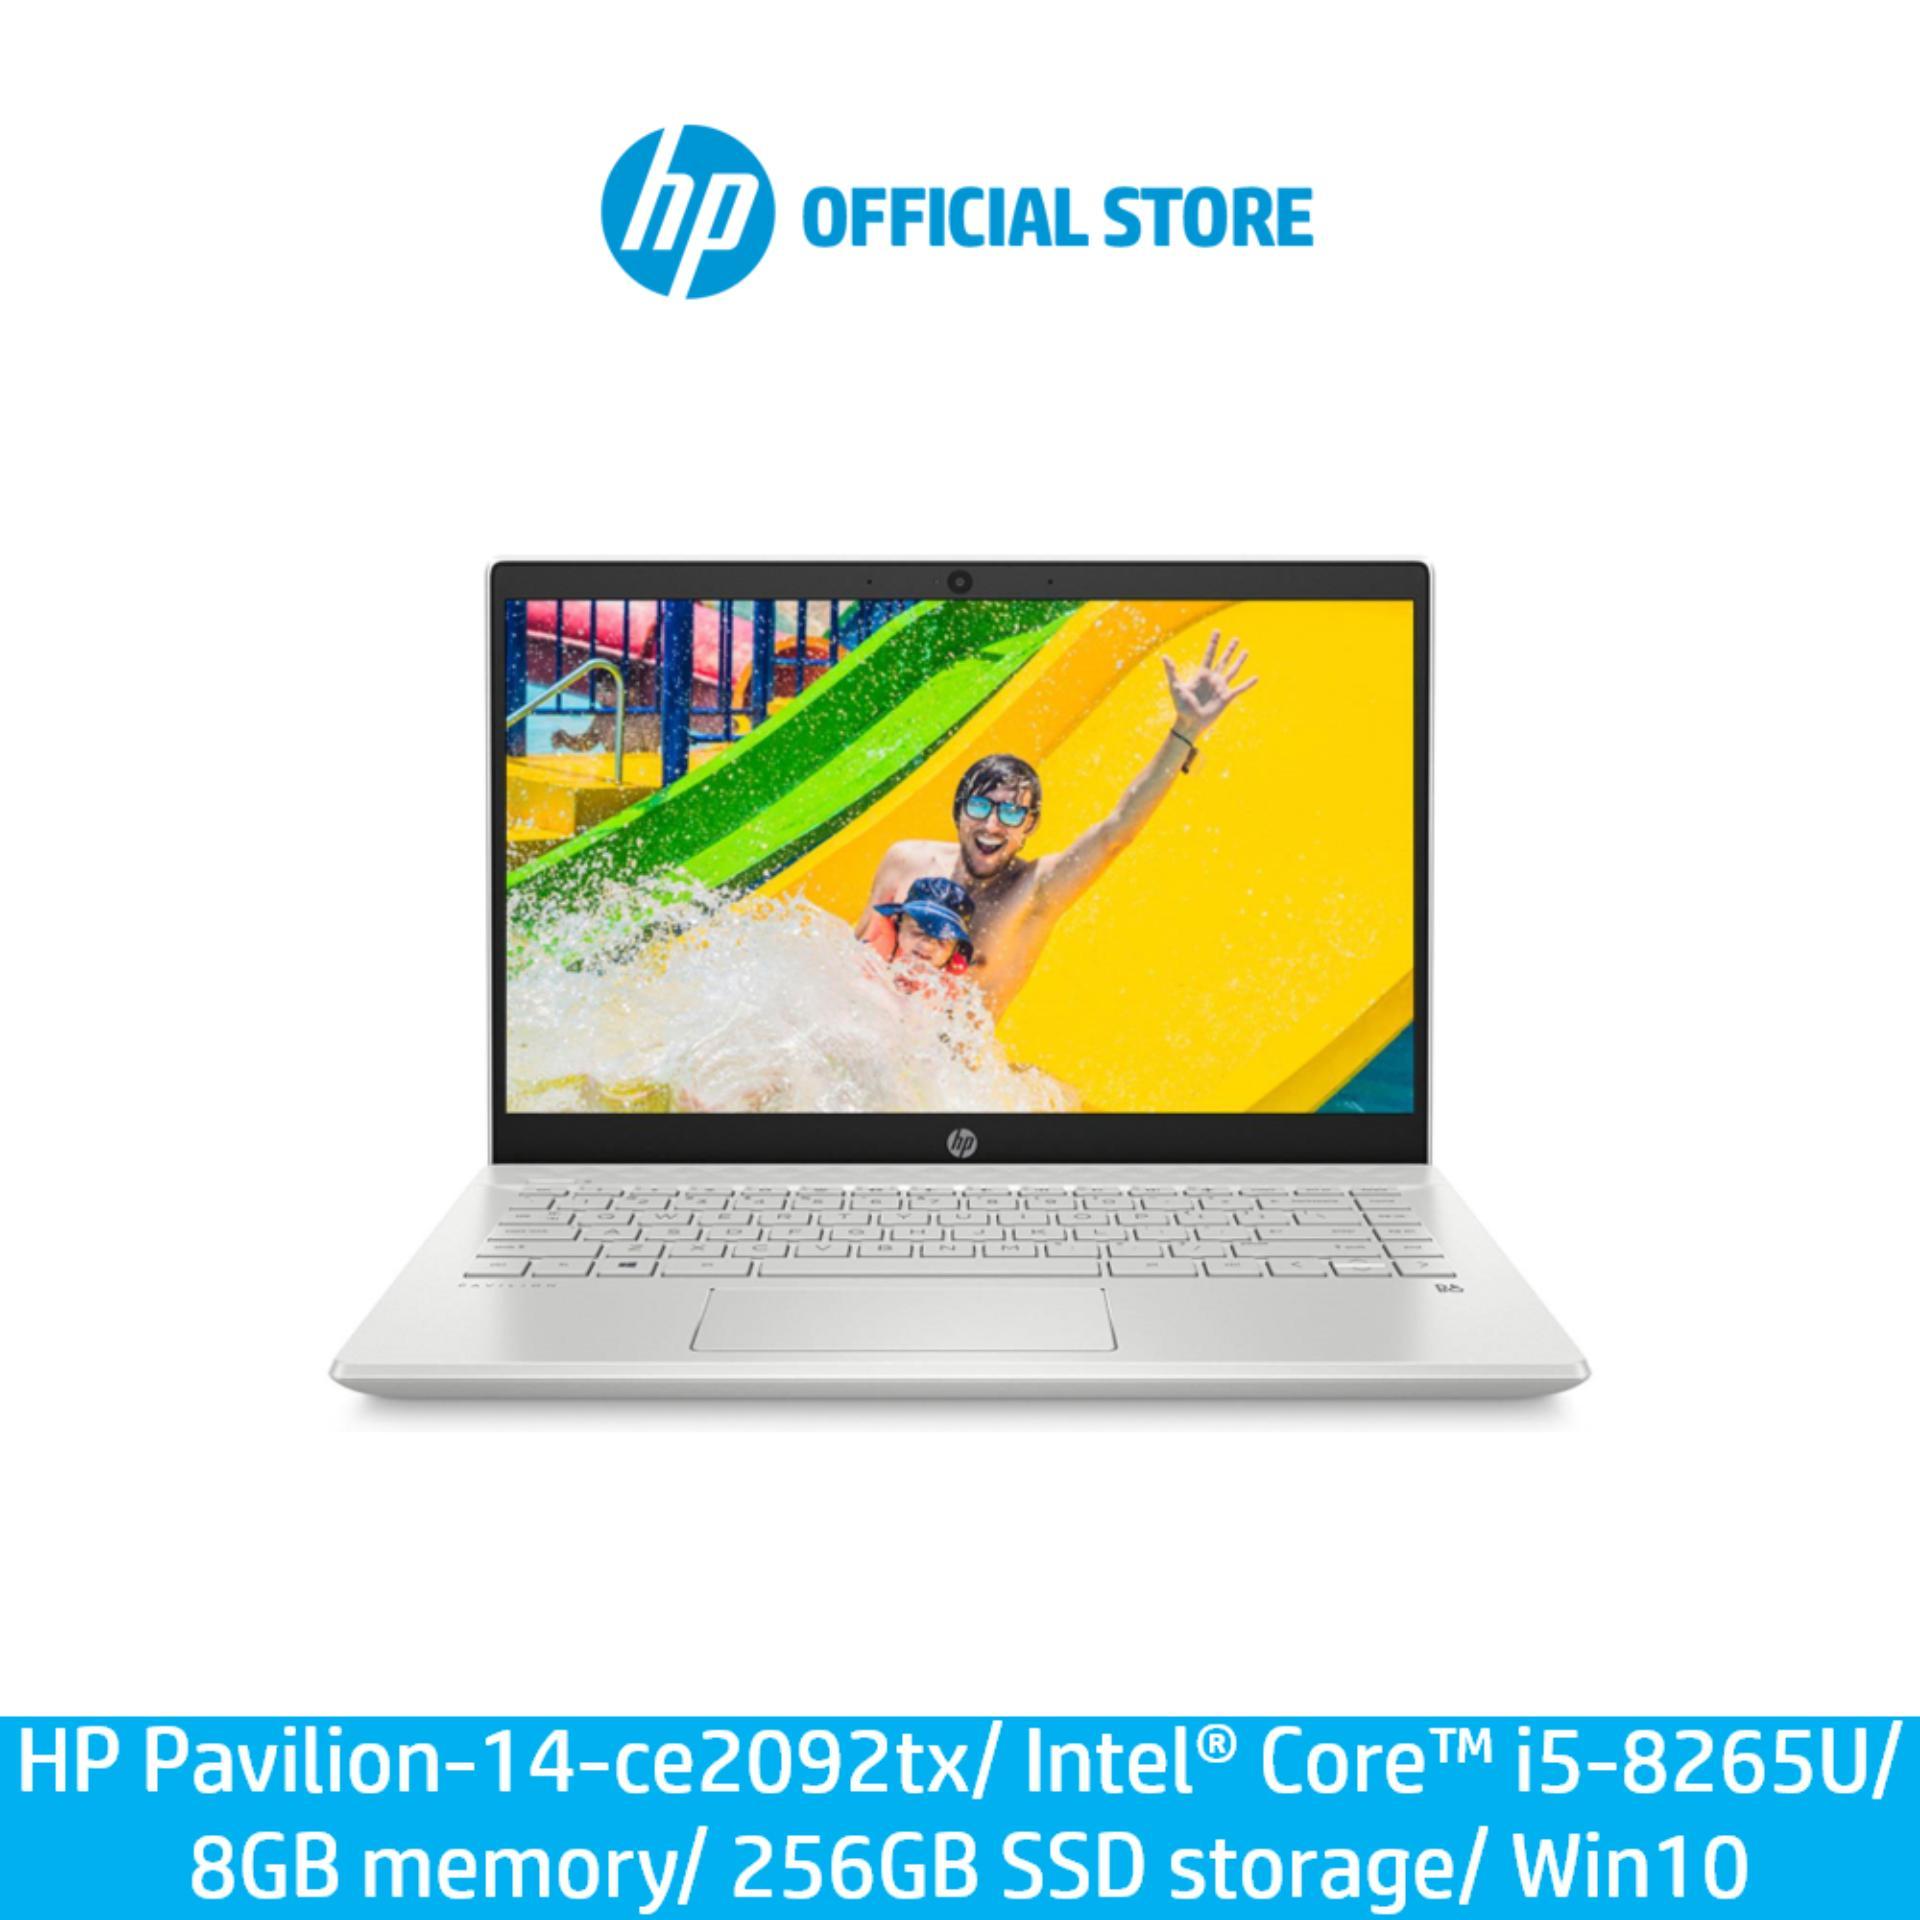 HP Pavilion - 14-ce2092tx/ Intel® Core™ i5-8265U/ 8 GB memory/ 256 GB SSD storage/ Win10